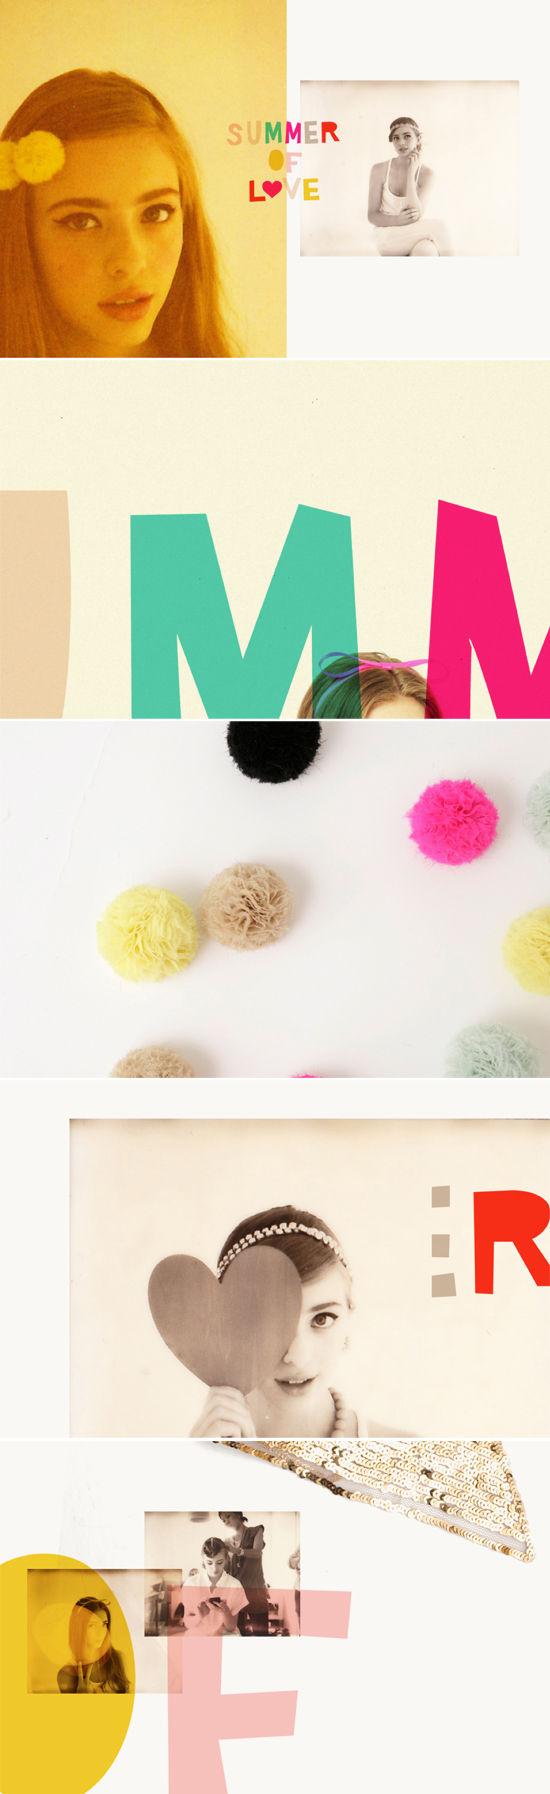 http://www.designlovefest.com/2011/09/lookbooks-are-my-favorite/